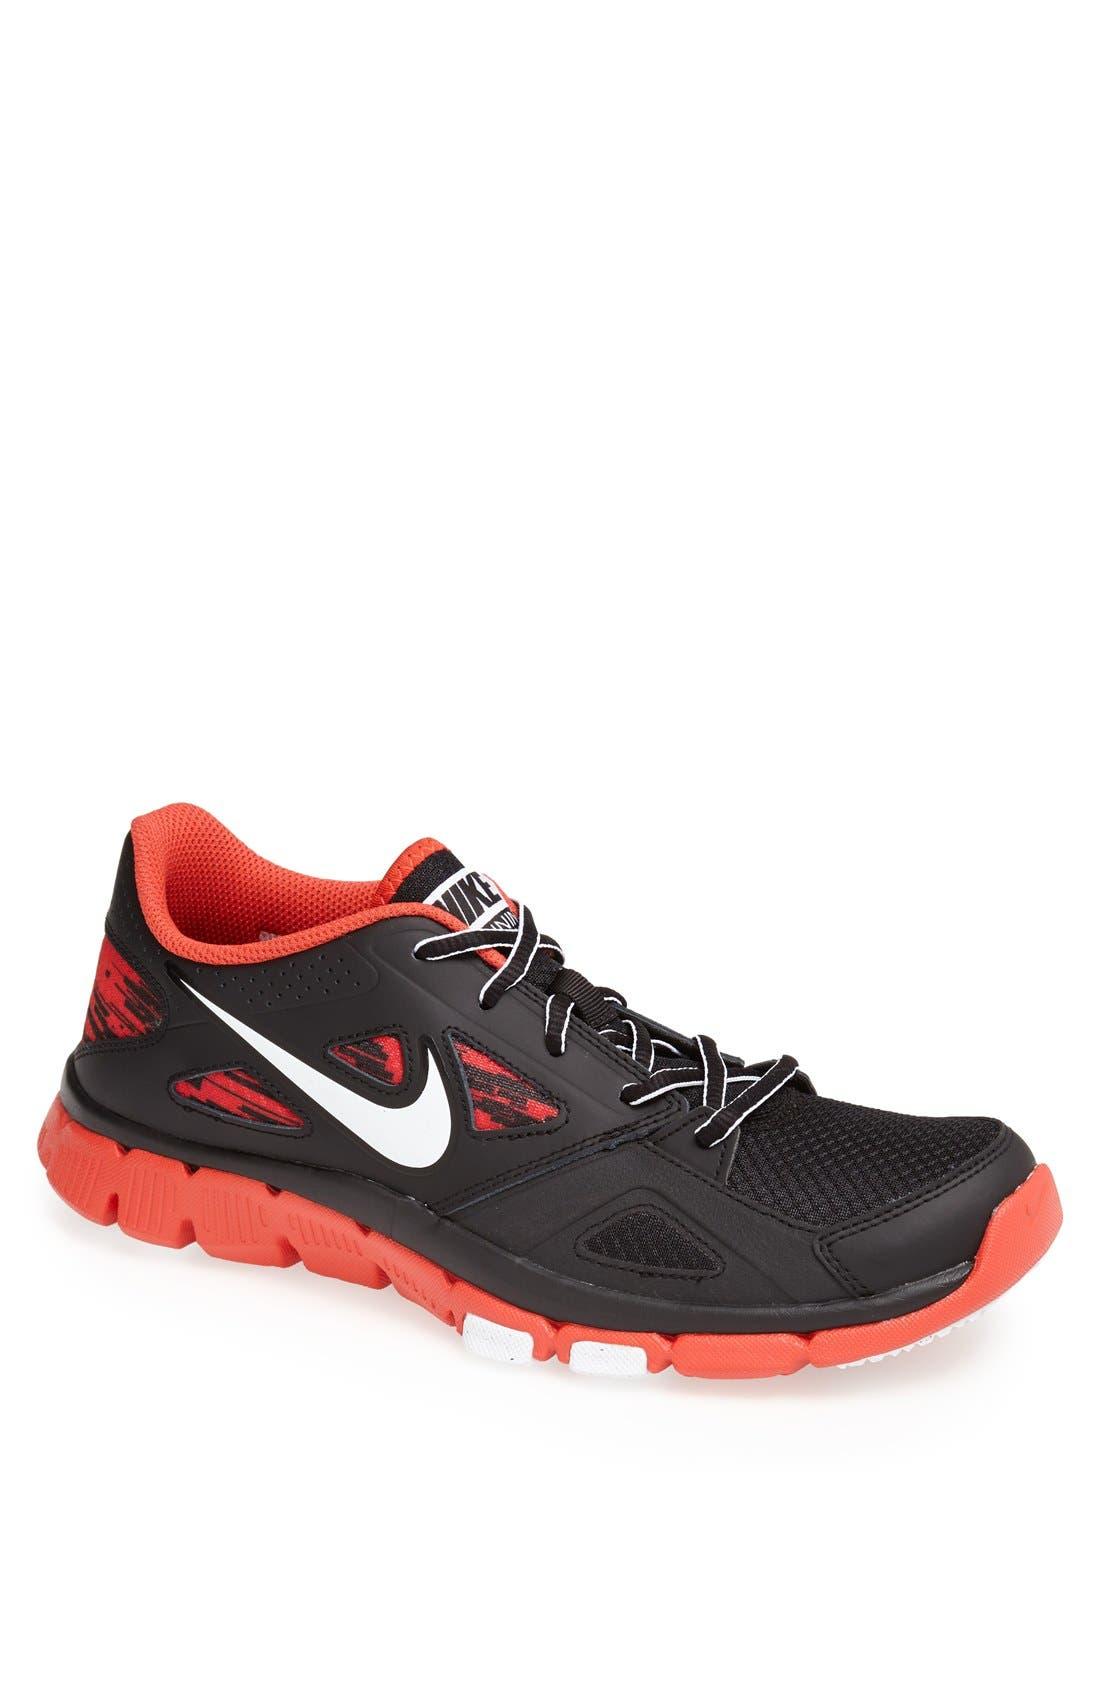 Alternate Image 1 Selected - Nike 'Flex Supreme TR 2' Training Shoe (Men)